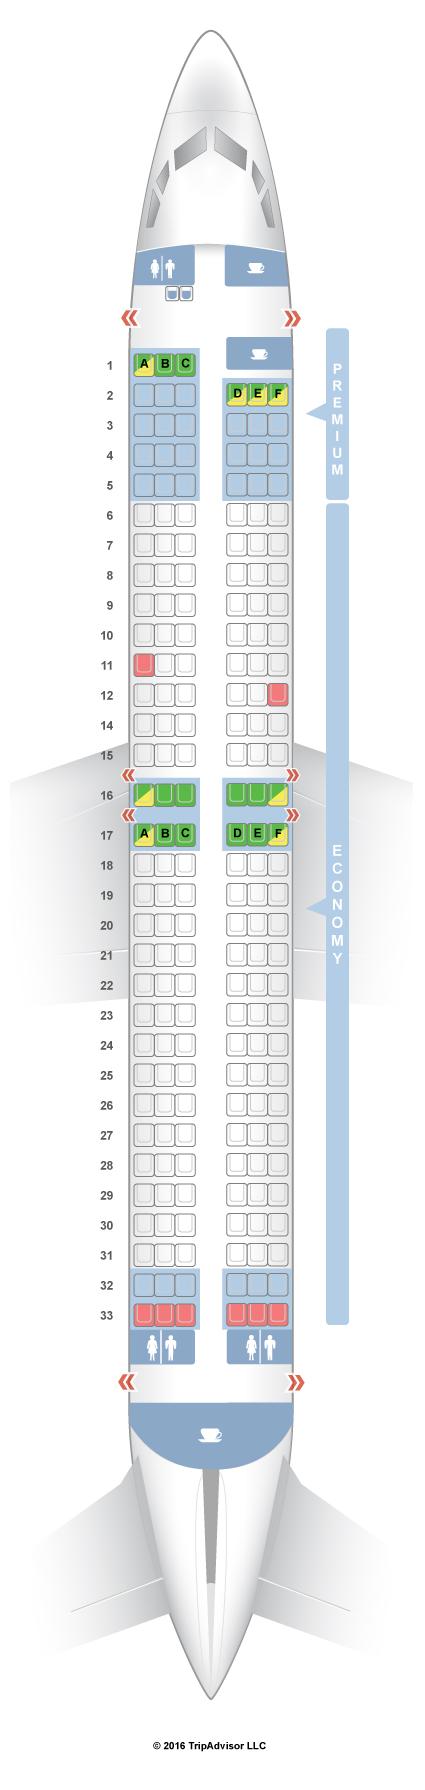 SeatGuru Seat Map Ryanair Boeing 737-800 (738)